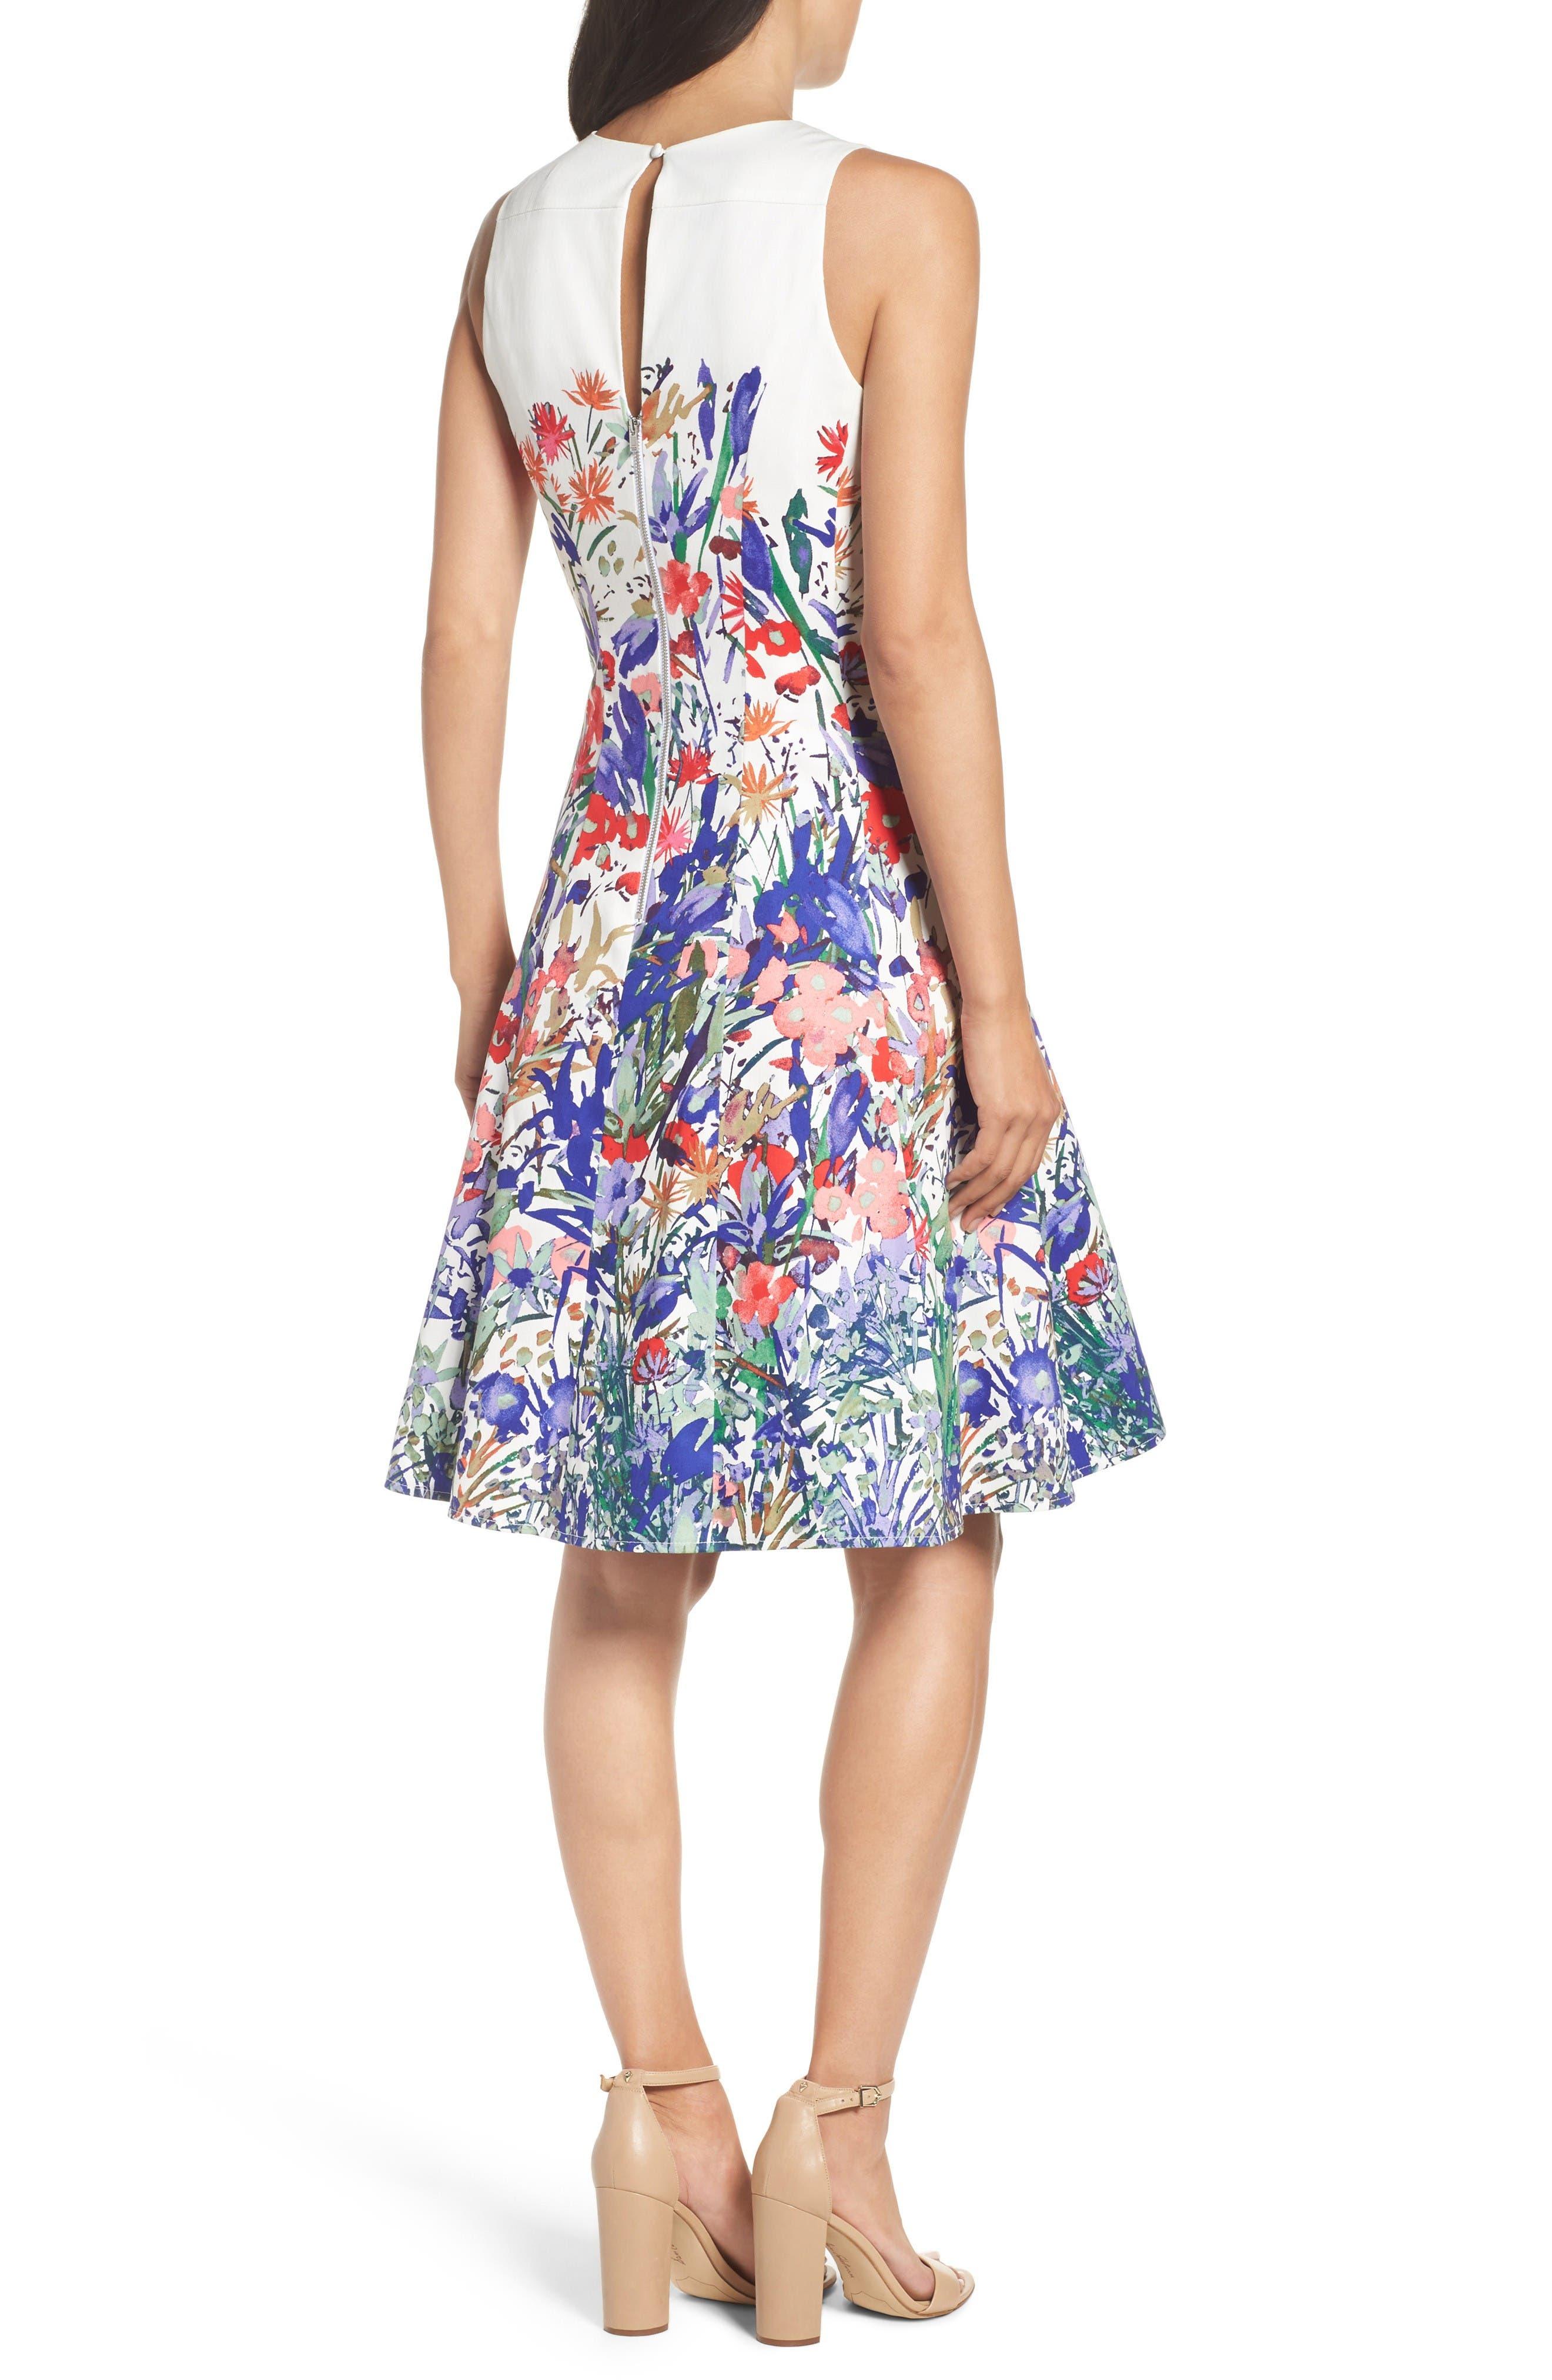 Cottage Garden Fit & Flare Dress,                             Alternate thumbnail 2, color,                             Soft White/ Coral/ Purple